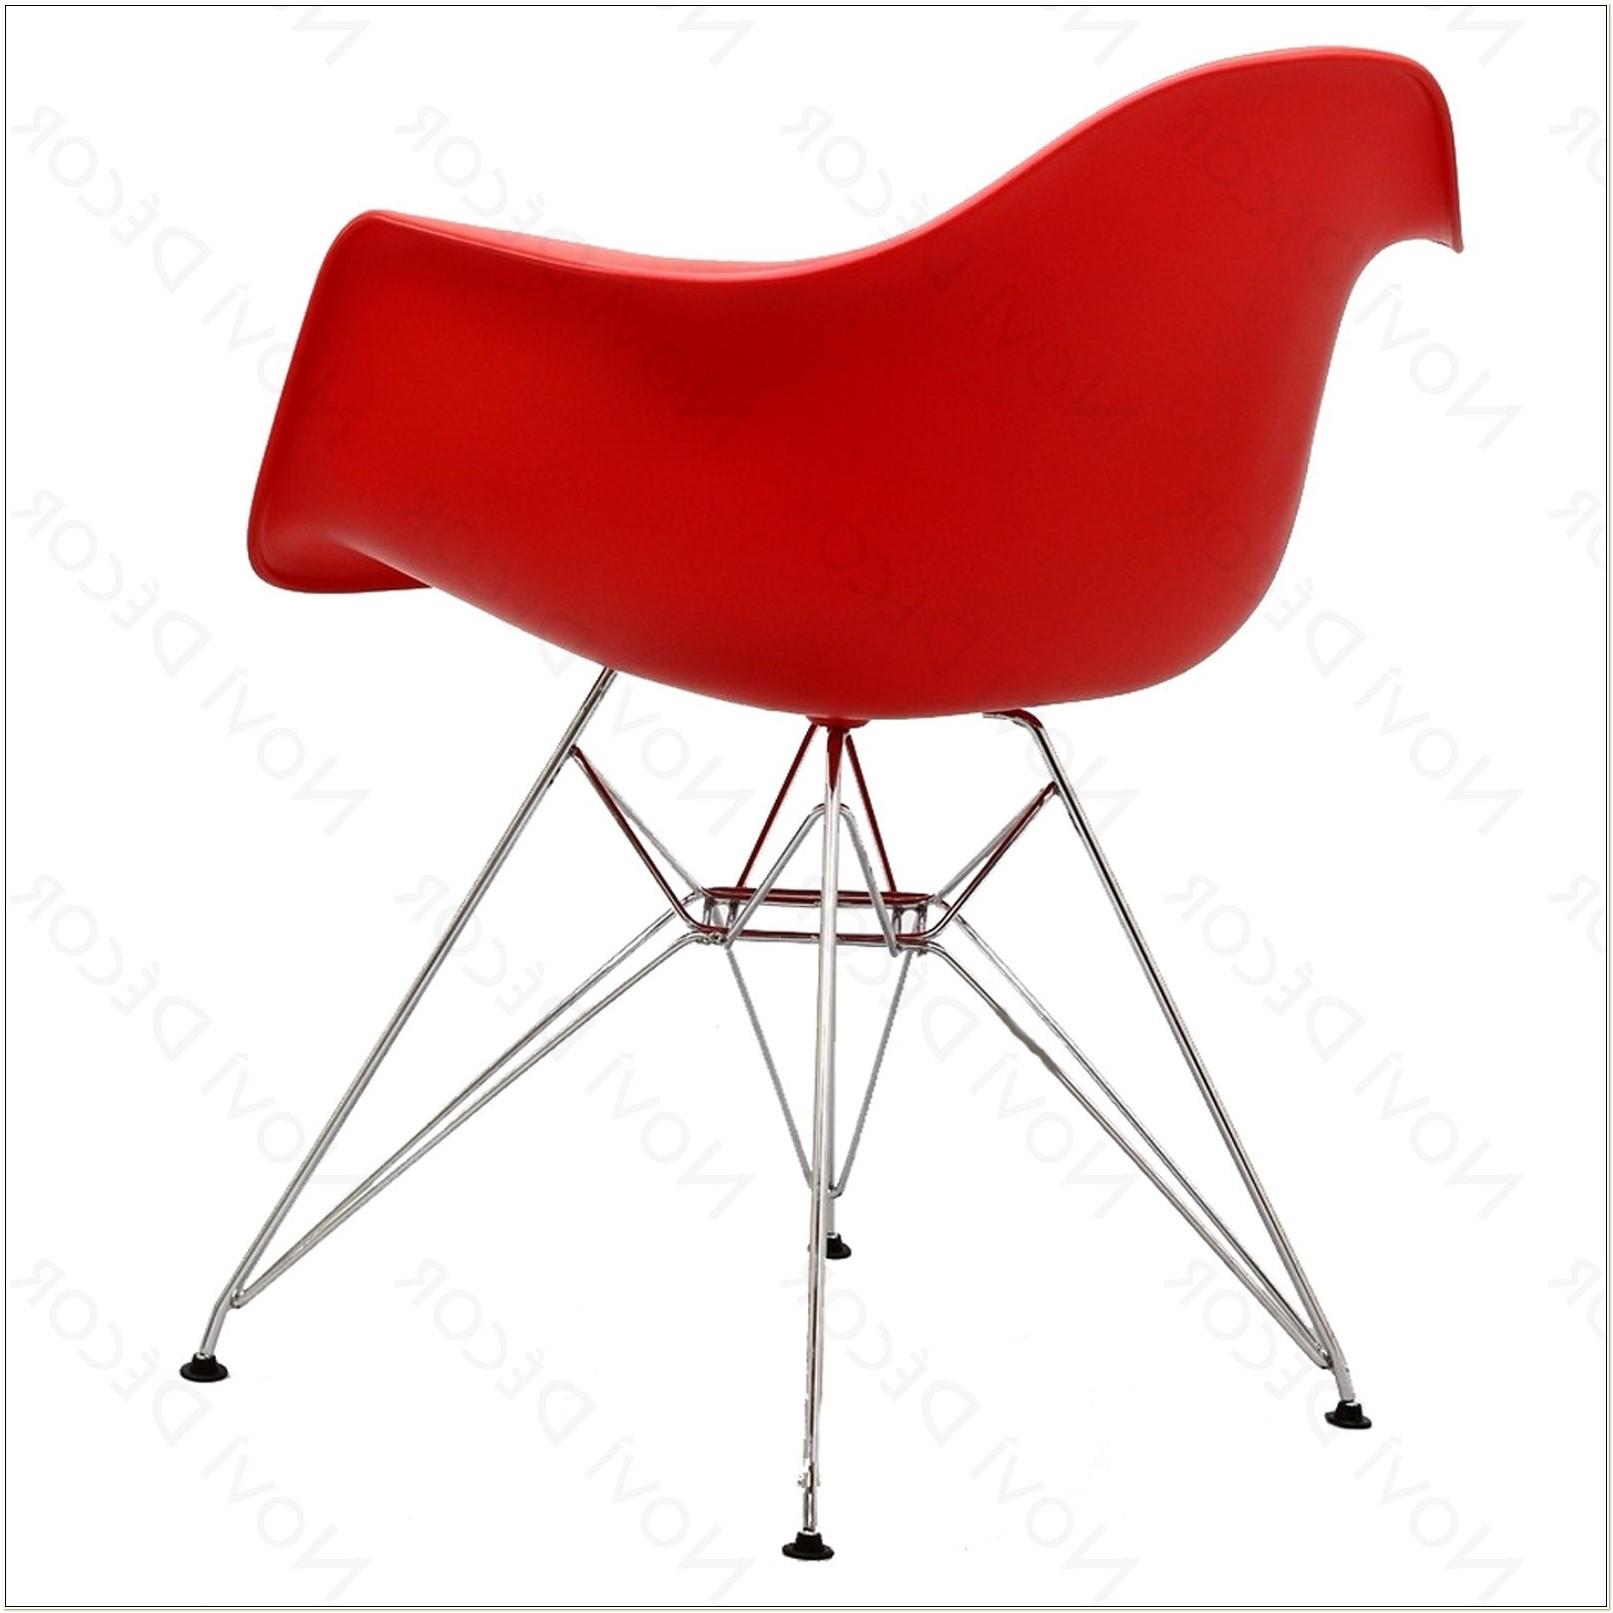 Eames Molded Plastic Chair Replica Canada